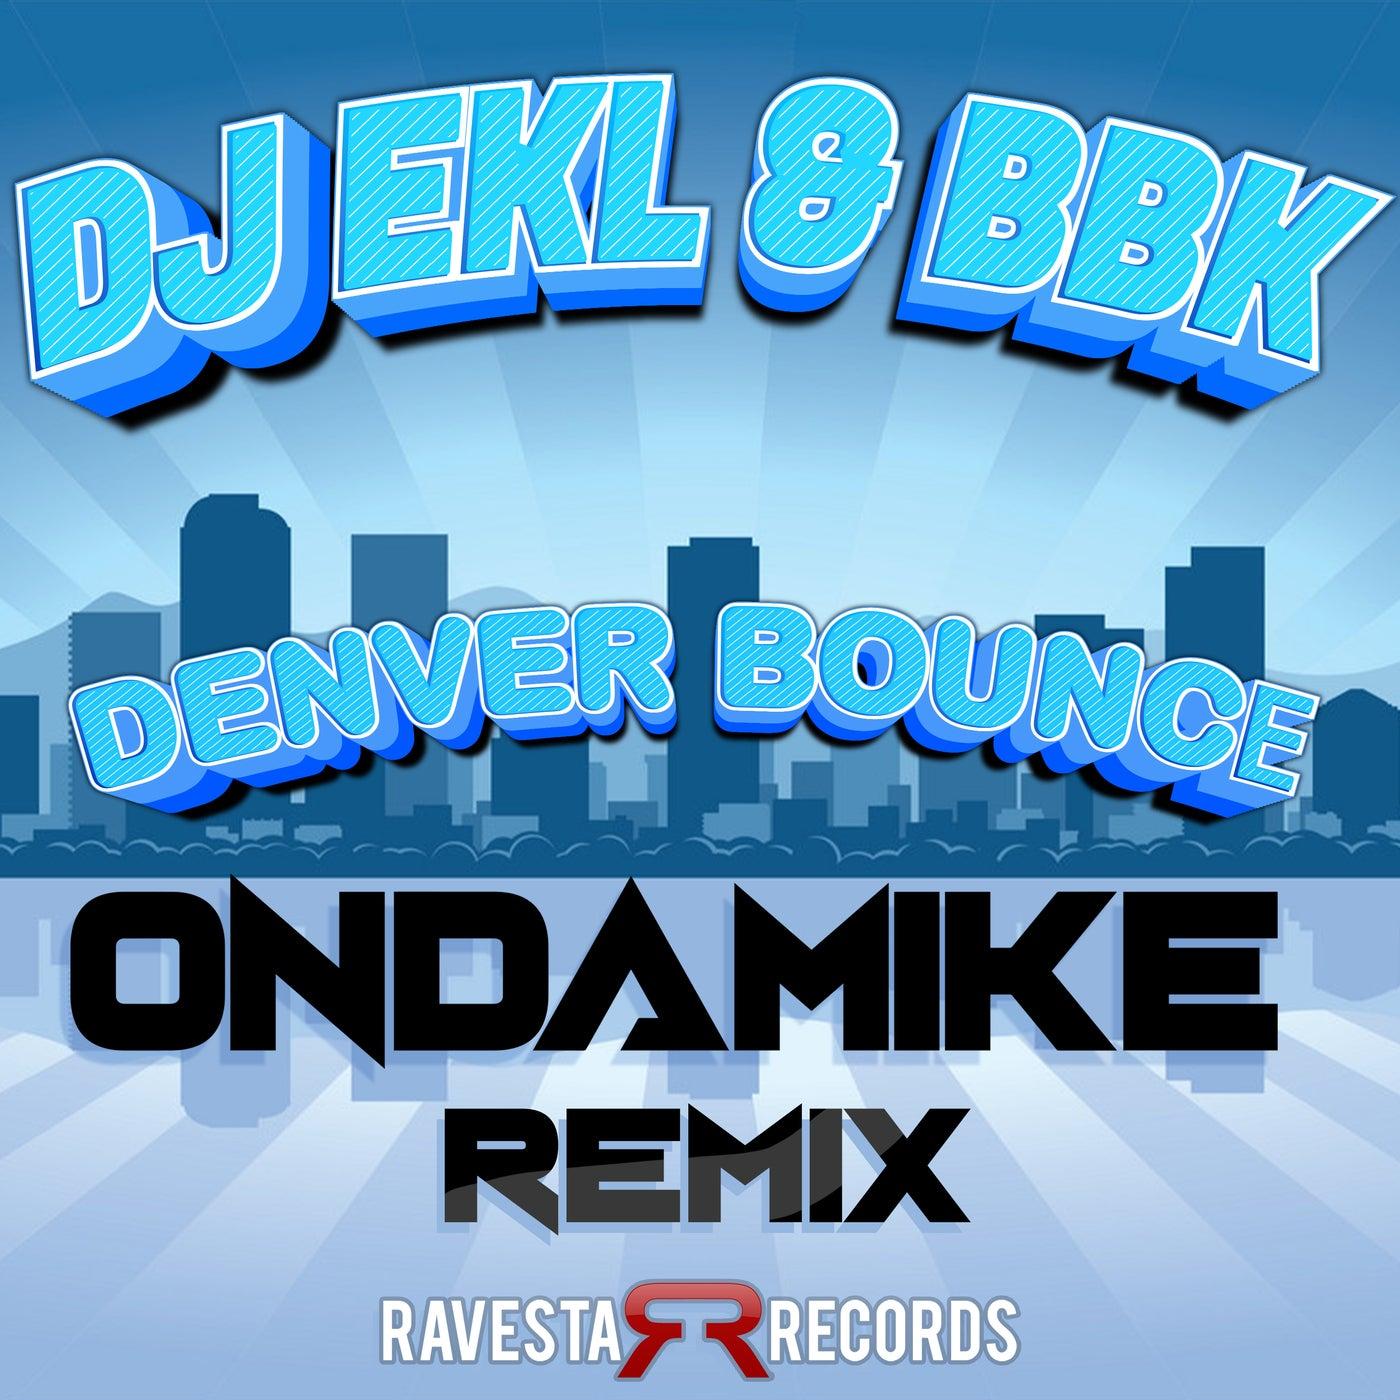 Denver Bounce (OnDaMiKe Remix)